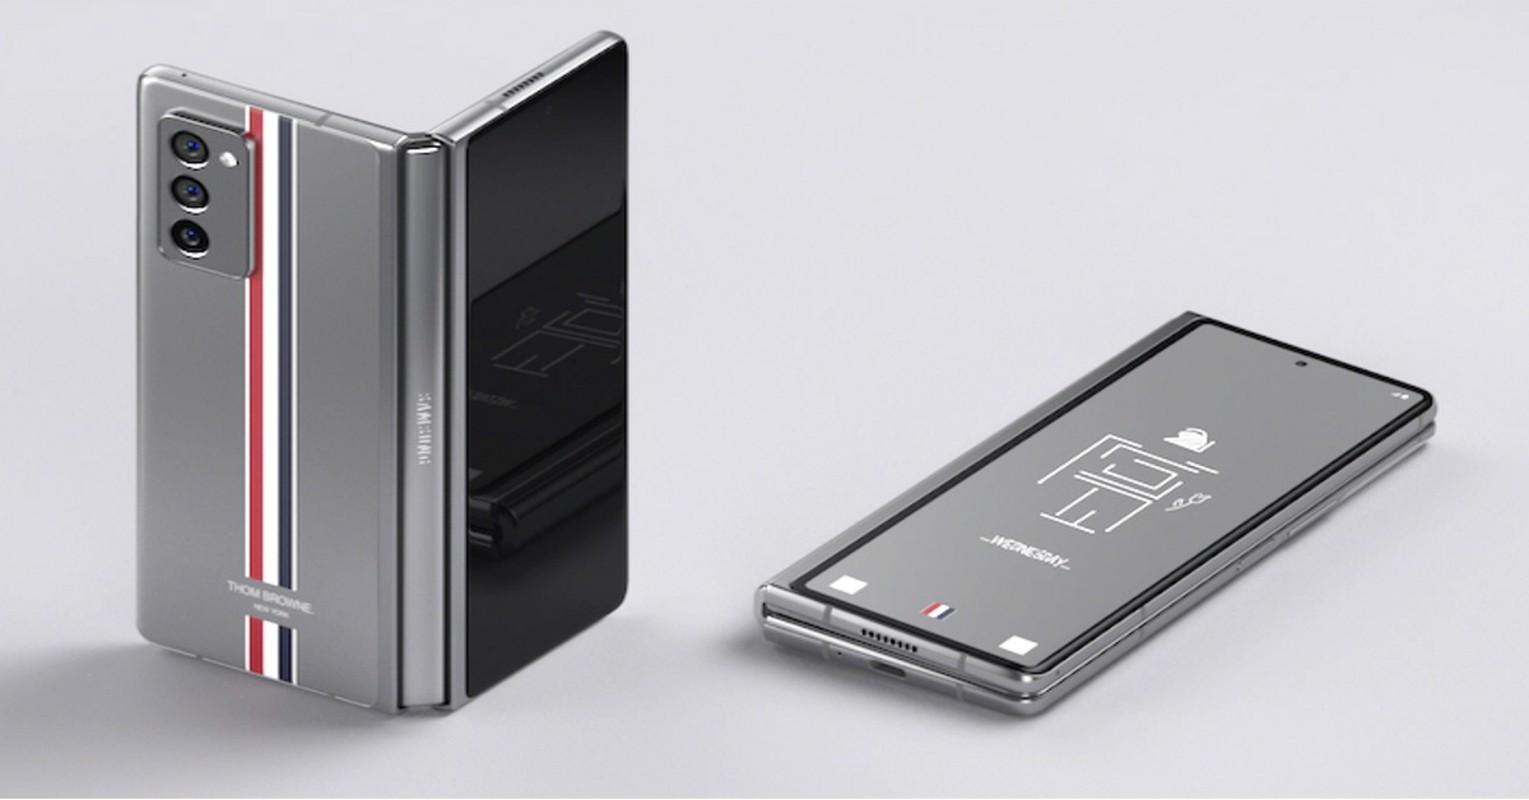 Samsung Galaxy Z Fold 2 ban sieu dac biet vua tung ra da het hang-Hinh-6